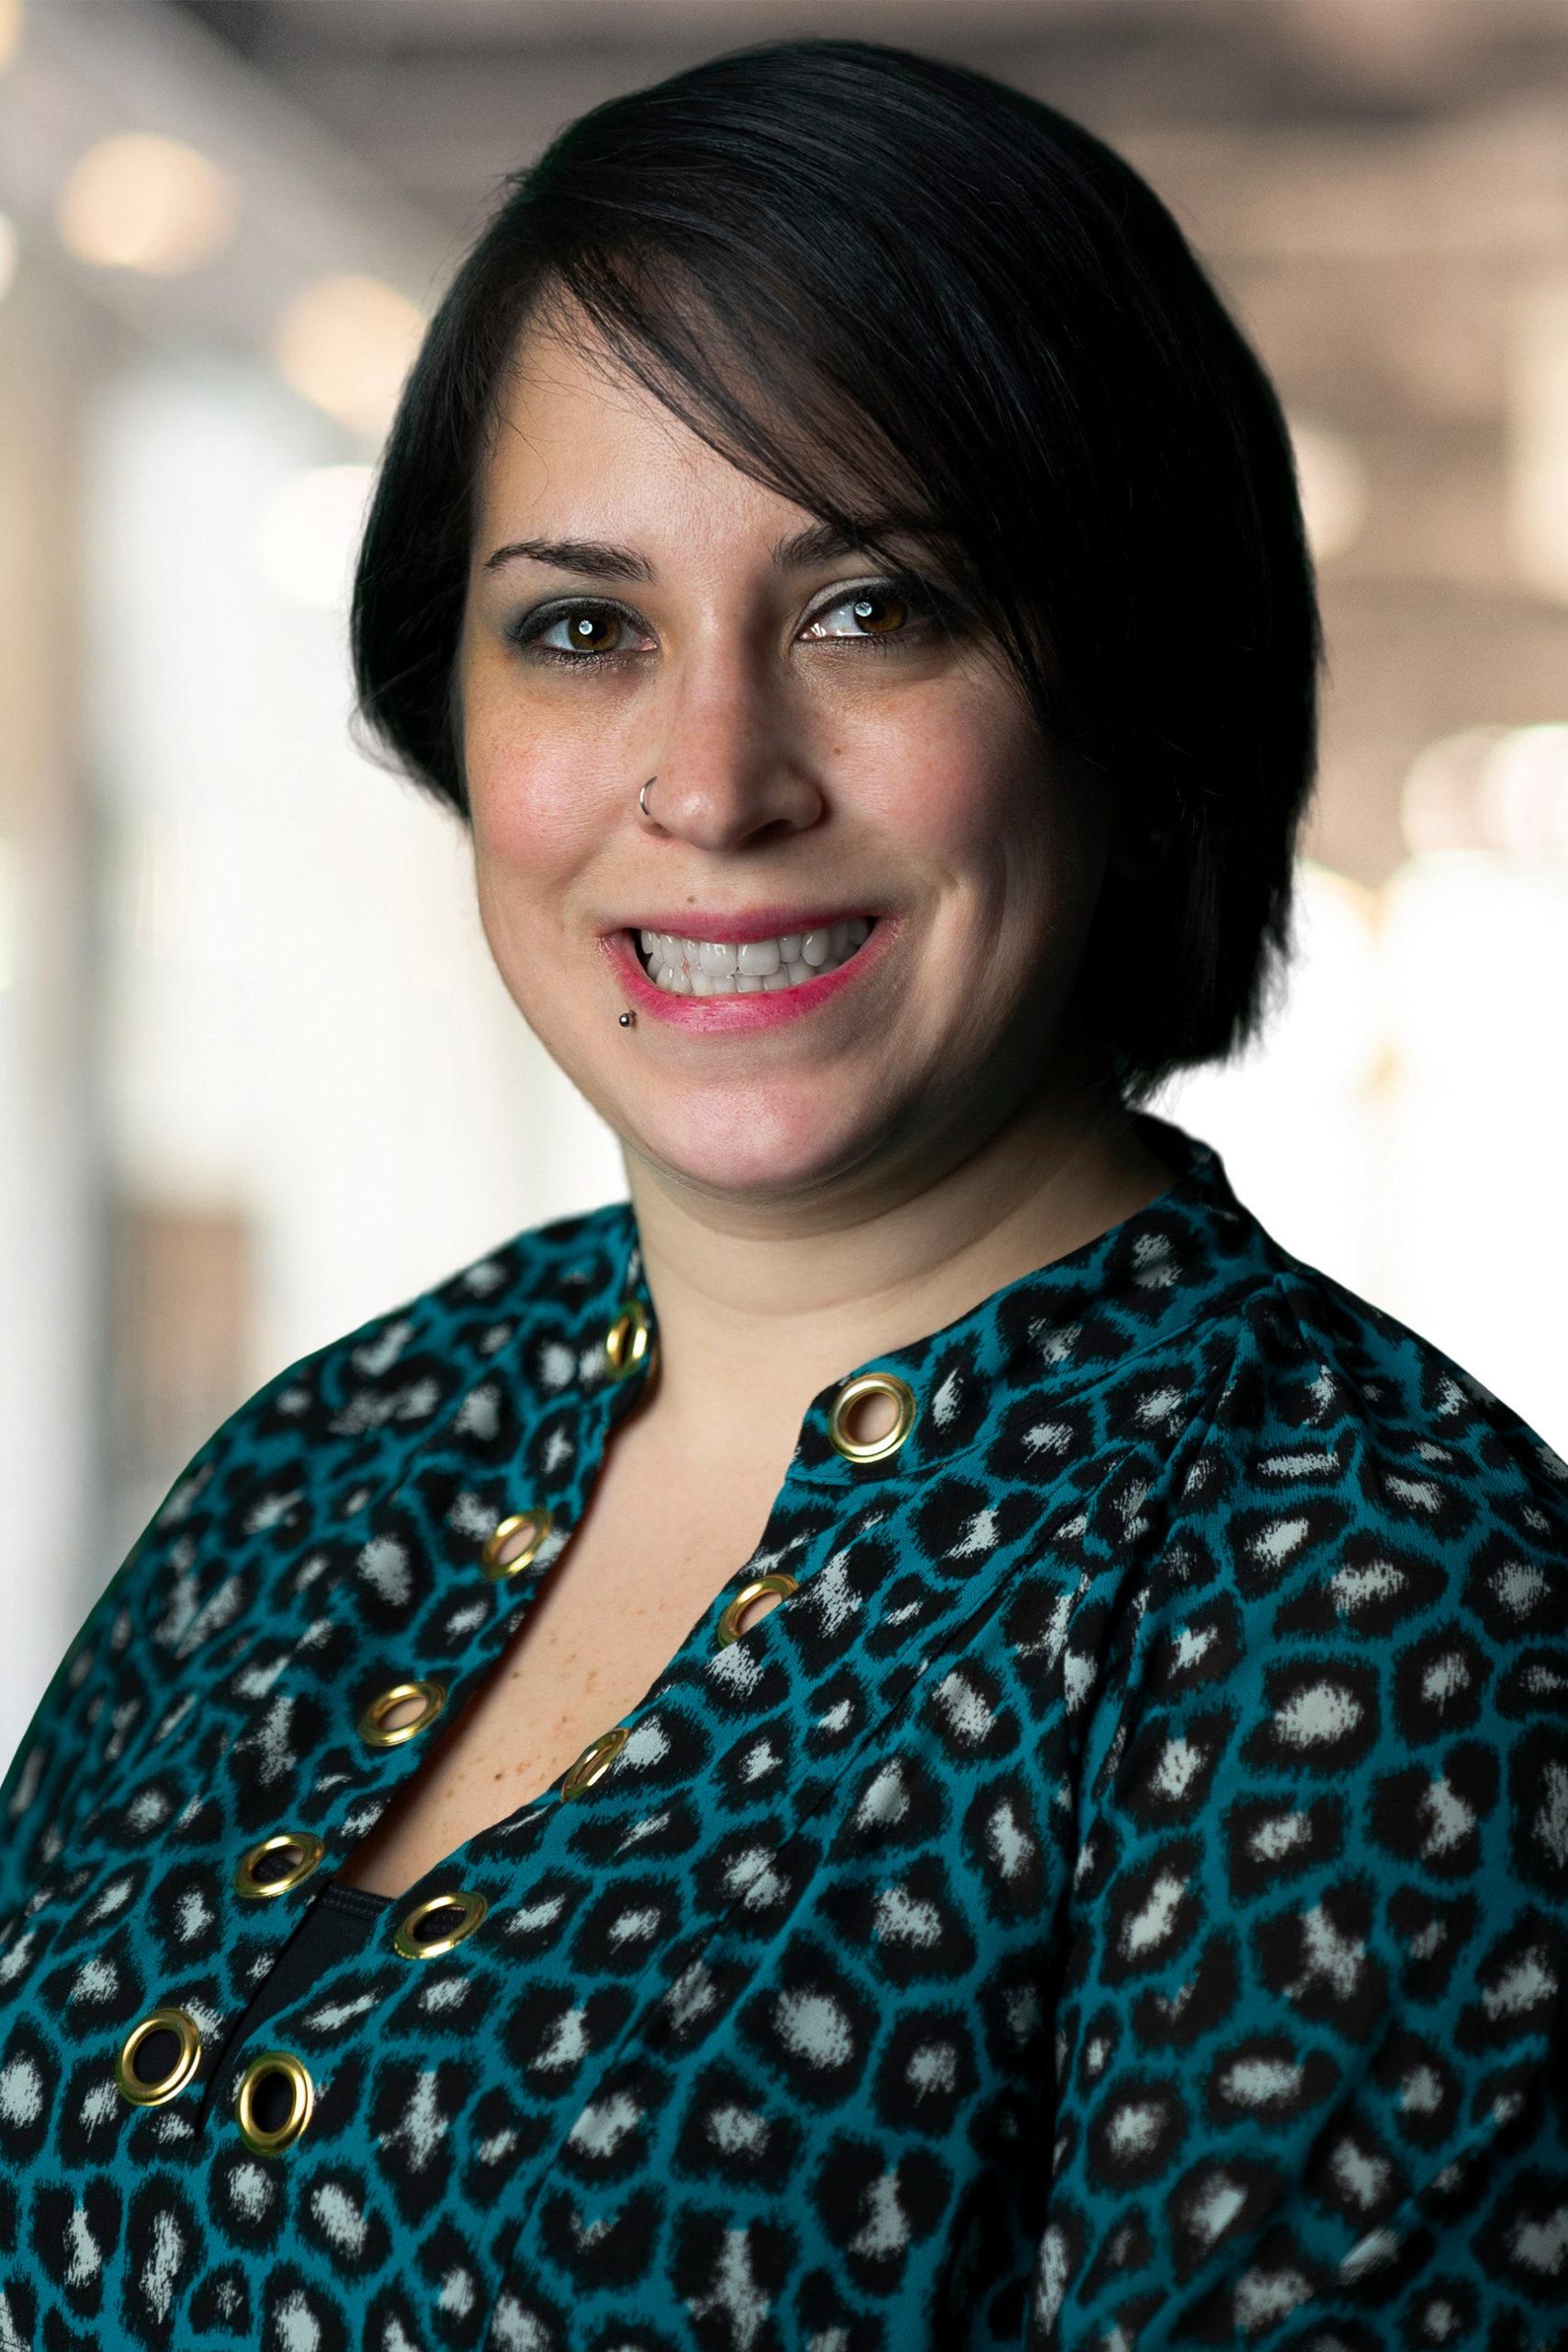 Meg <span>Project Coordinator</span>